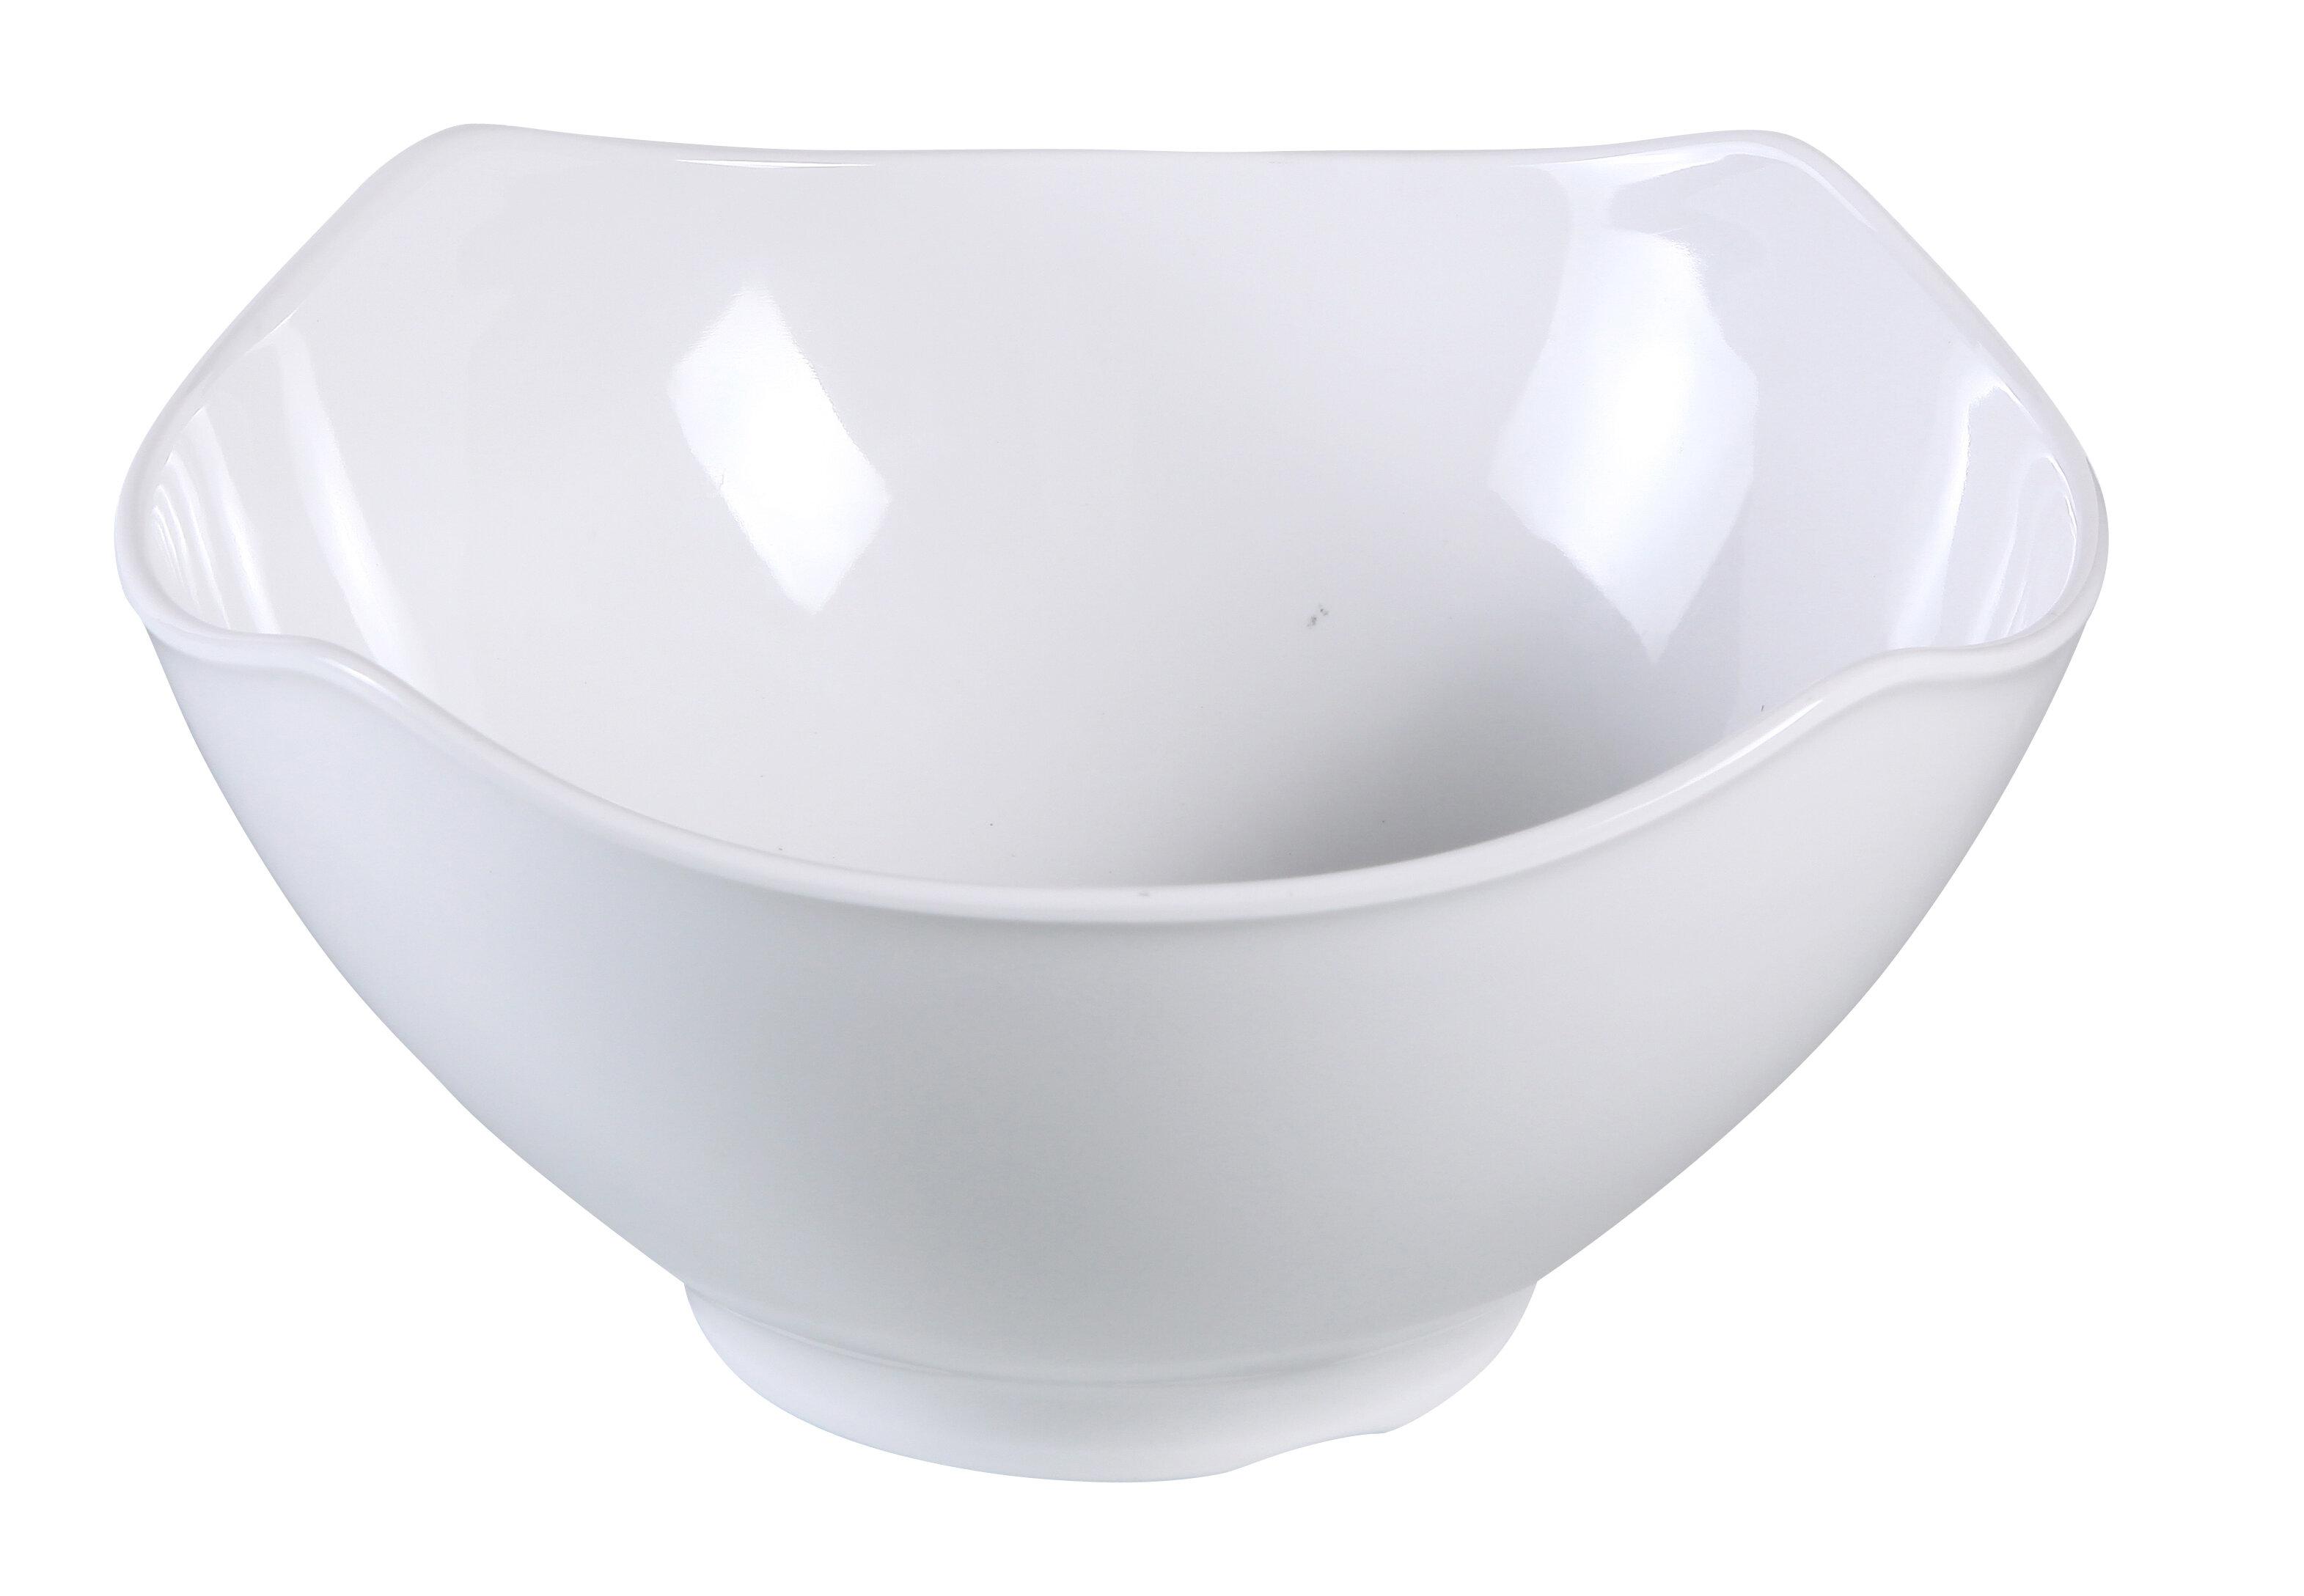 Darby Home Co Sedbergh 30 Oz Square Melamine Salad Bowl Wayfair